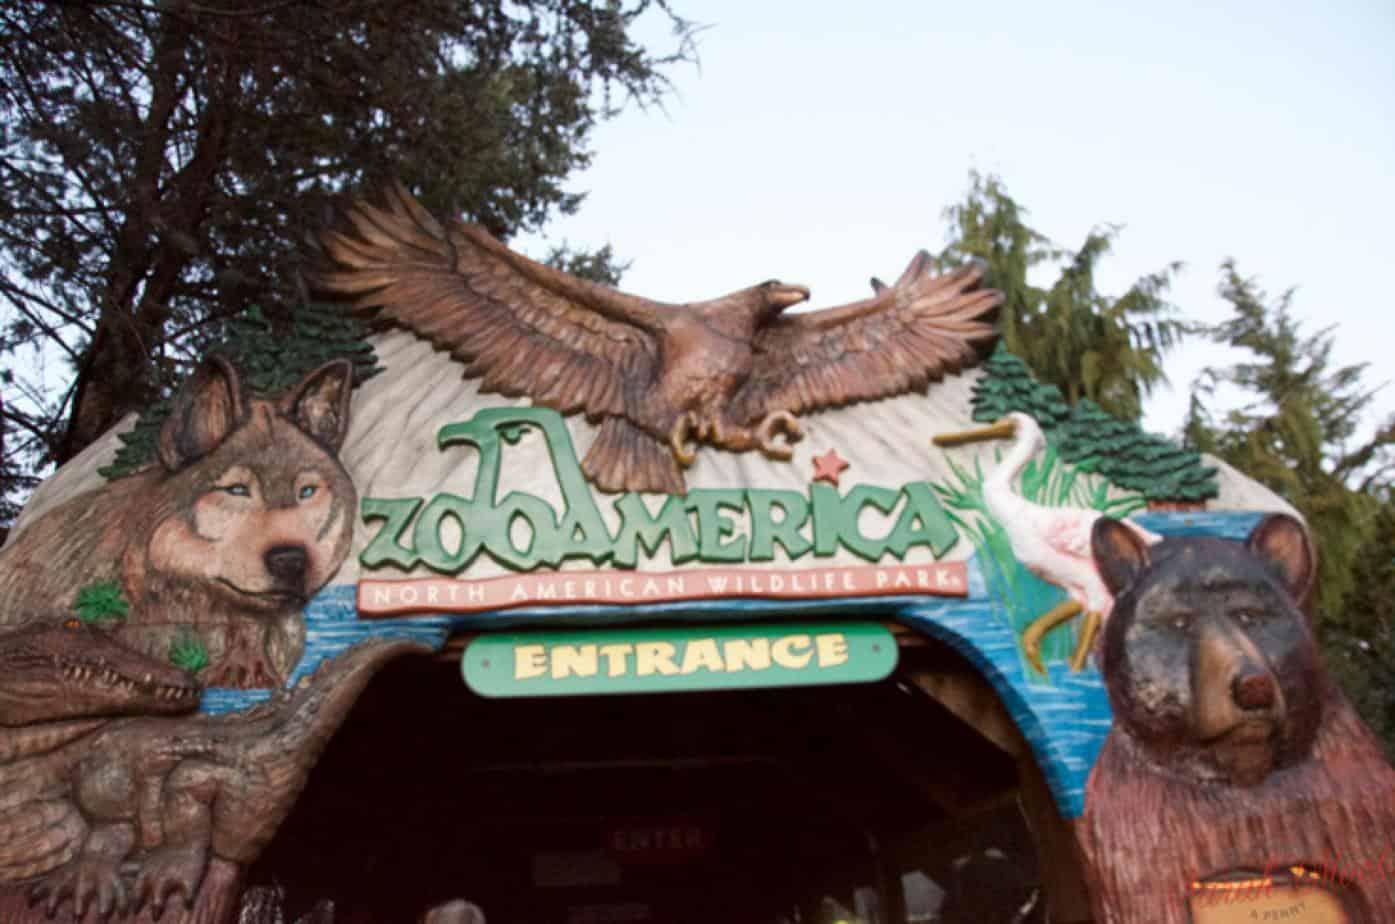 entrance to zooAmerica